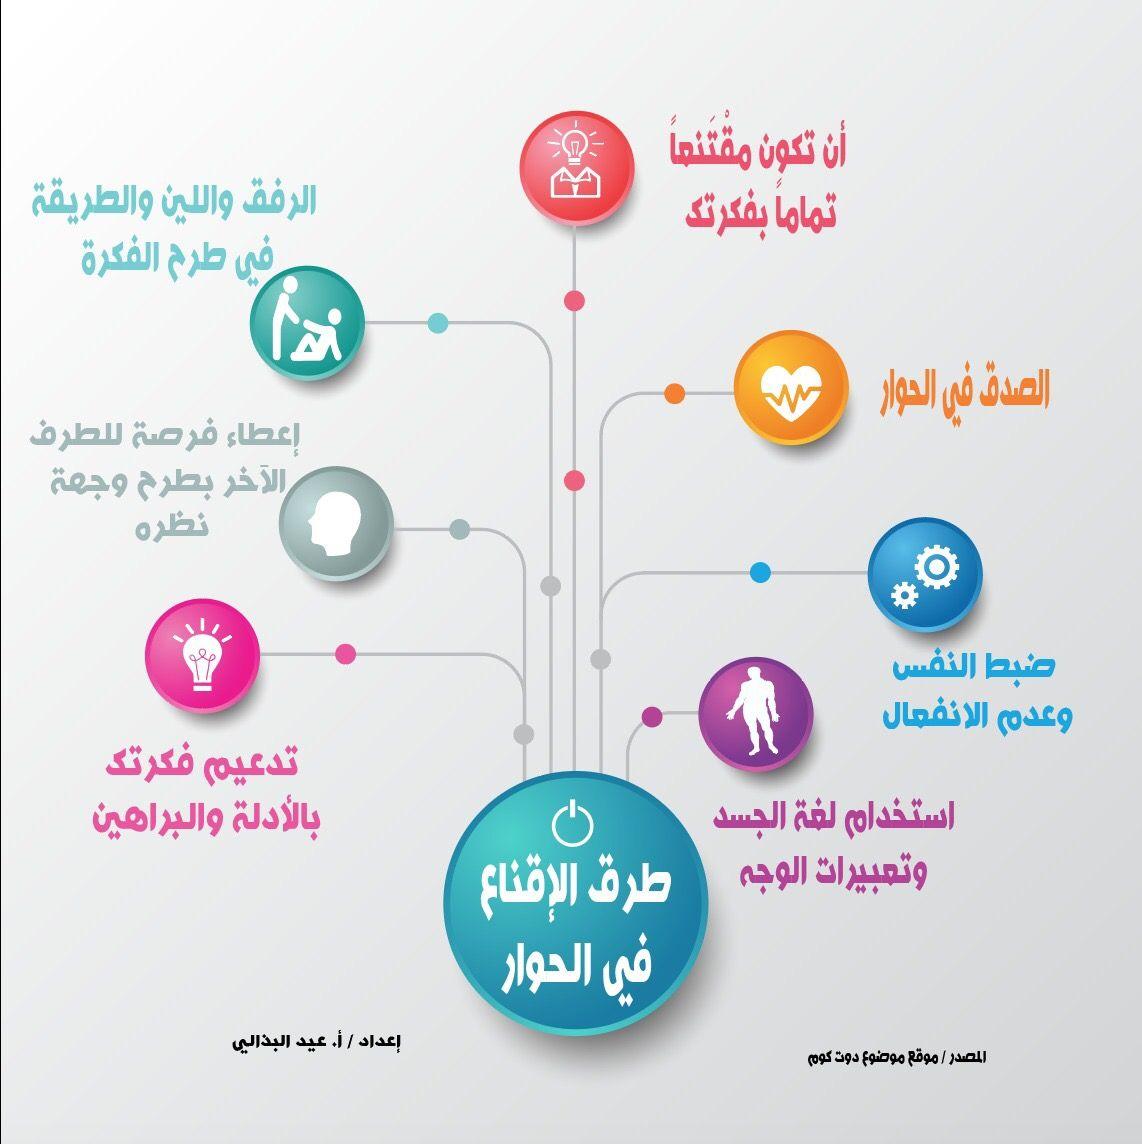 Pin By Saeed On نصائح لتطوير الذات Public Information Everything